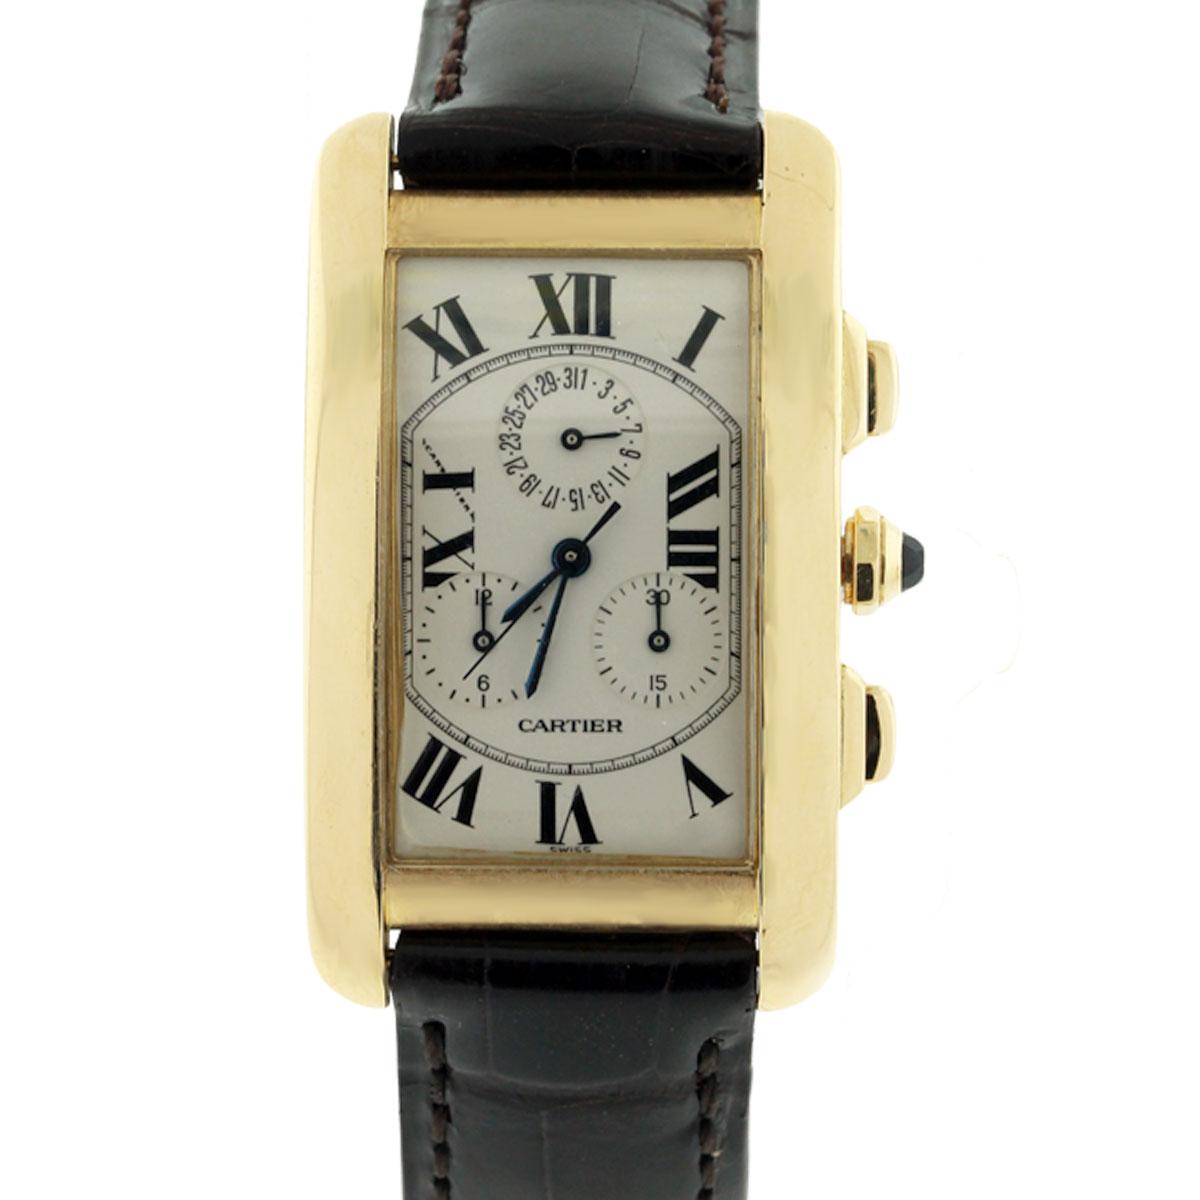 Cartier Tank Americaine 1750 Chronograph 18k Gold Watch